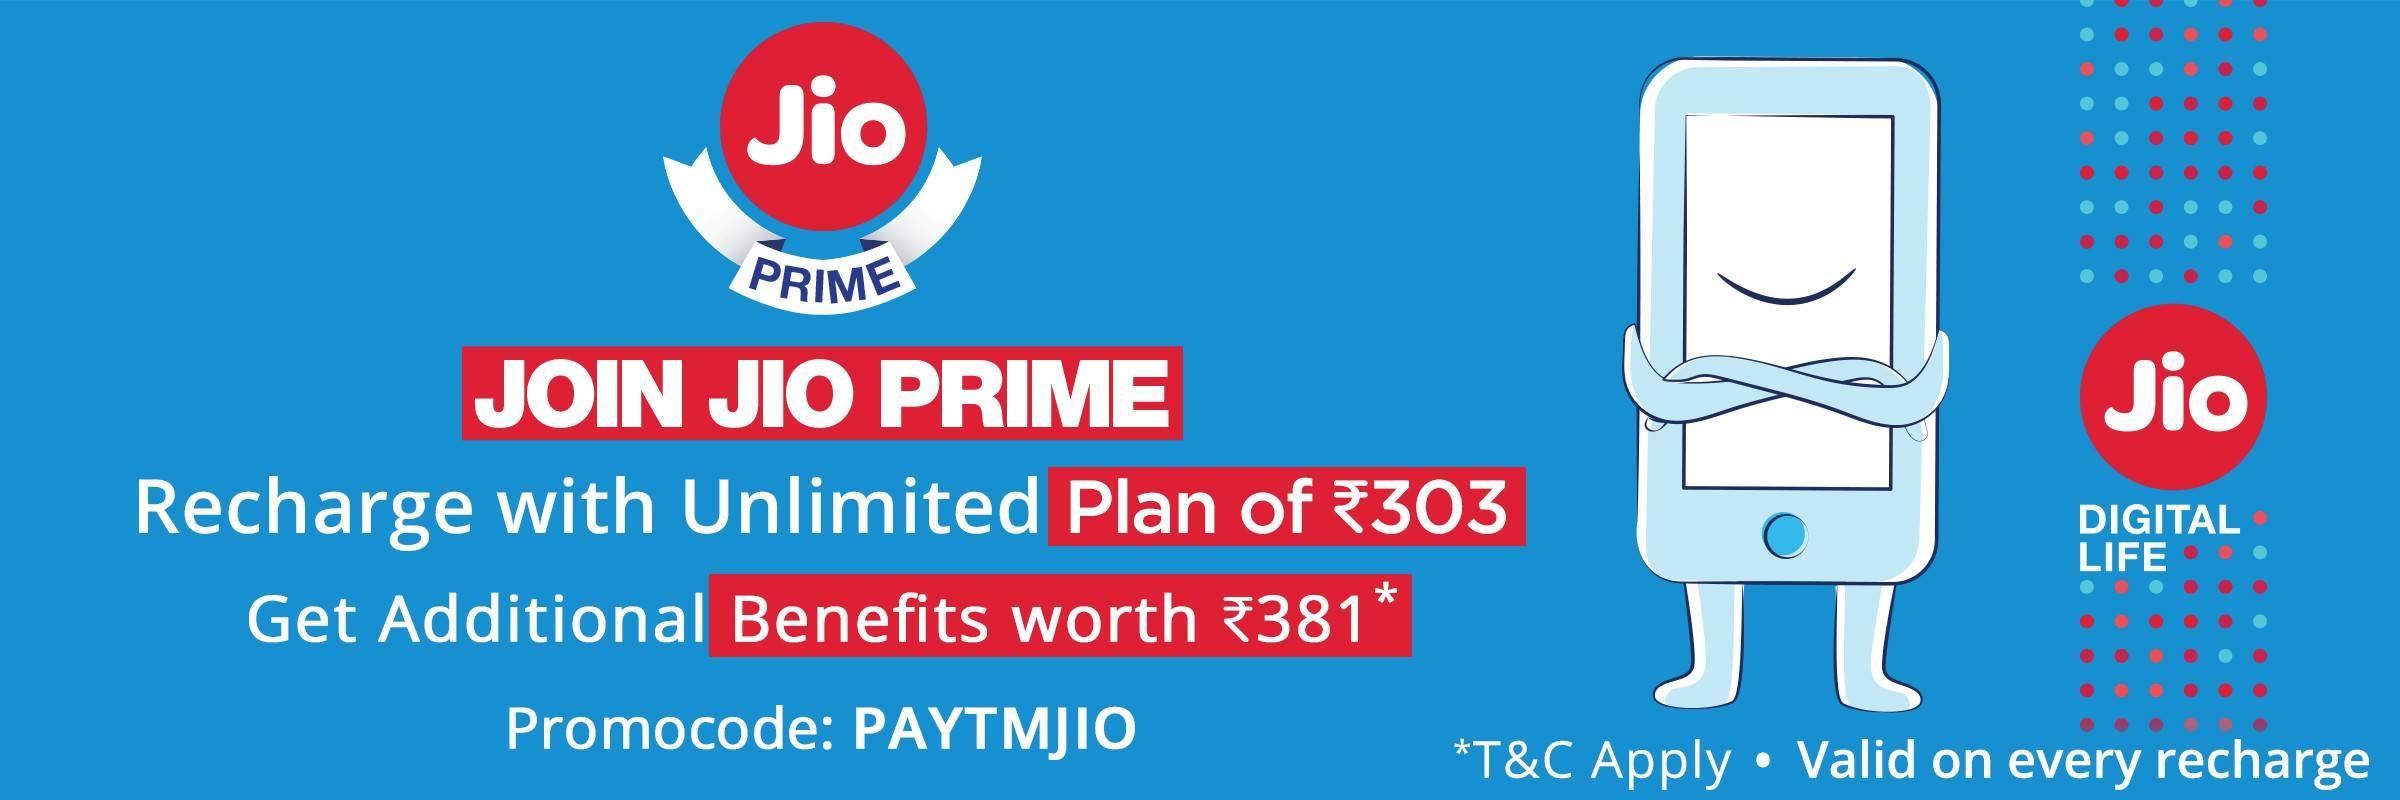 Recharge Your Reliance Jio No. Via Paytm: All Prime & Non-Prime Plans